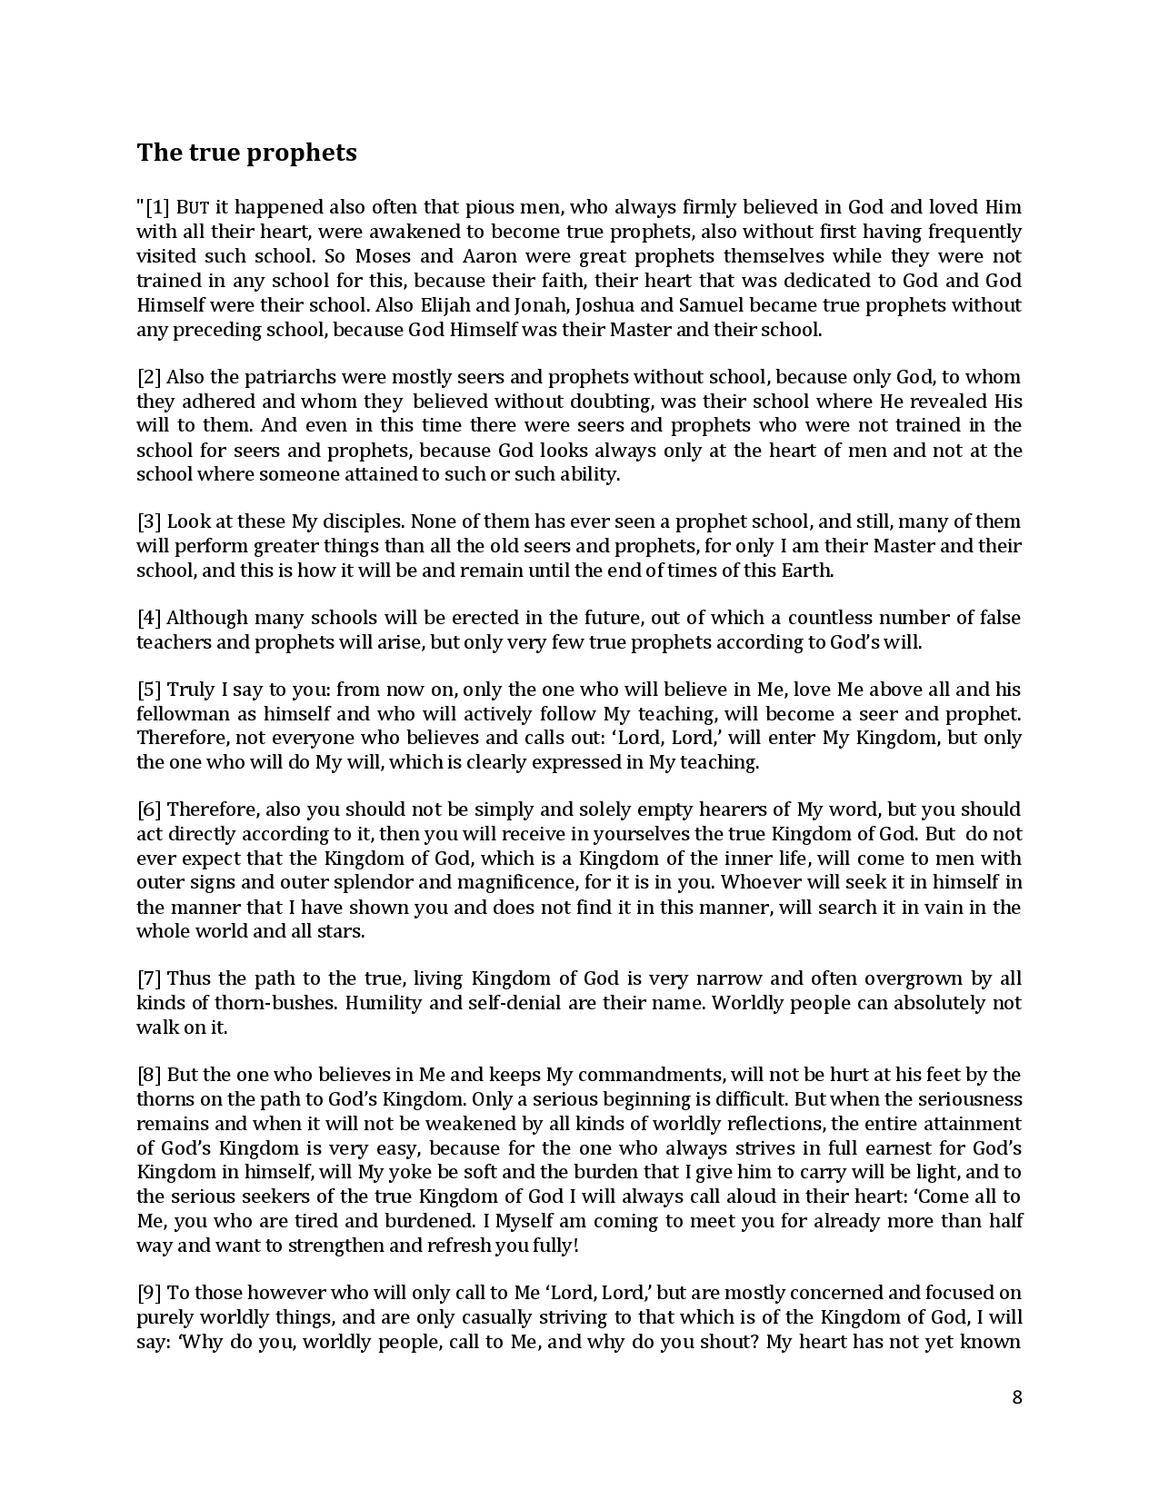 Brochure - NEW REVELATION - ABOUT TRUE AND FALSE PROPHETS